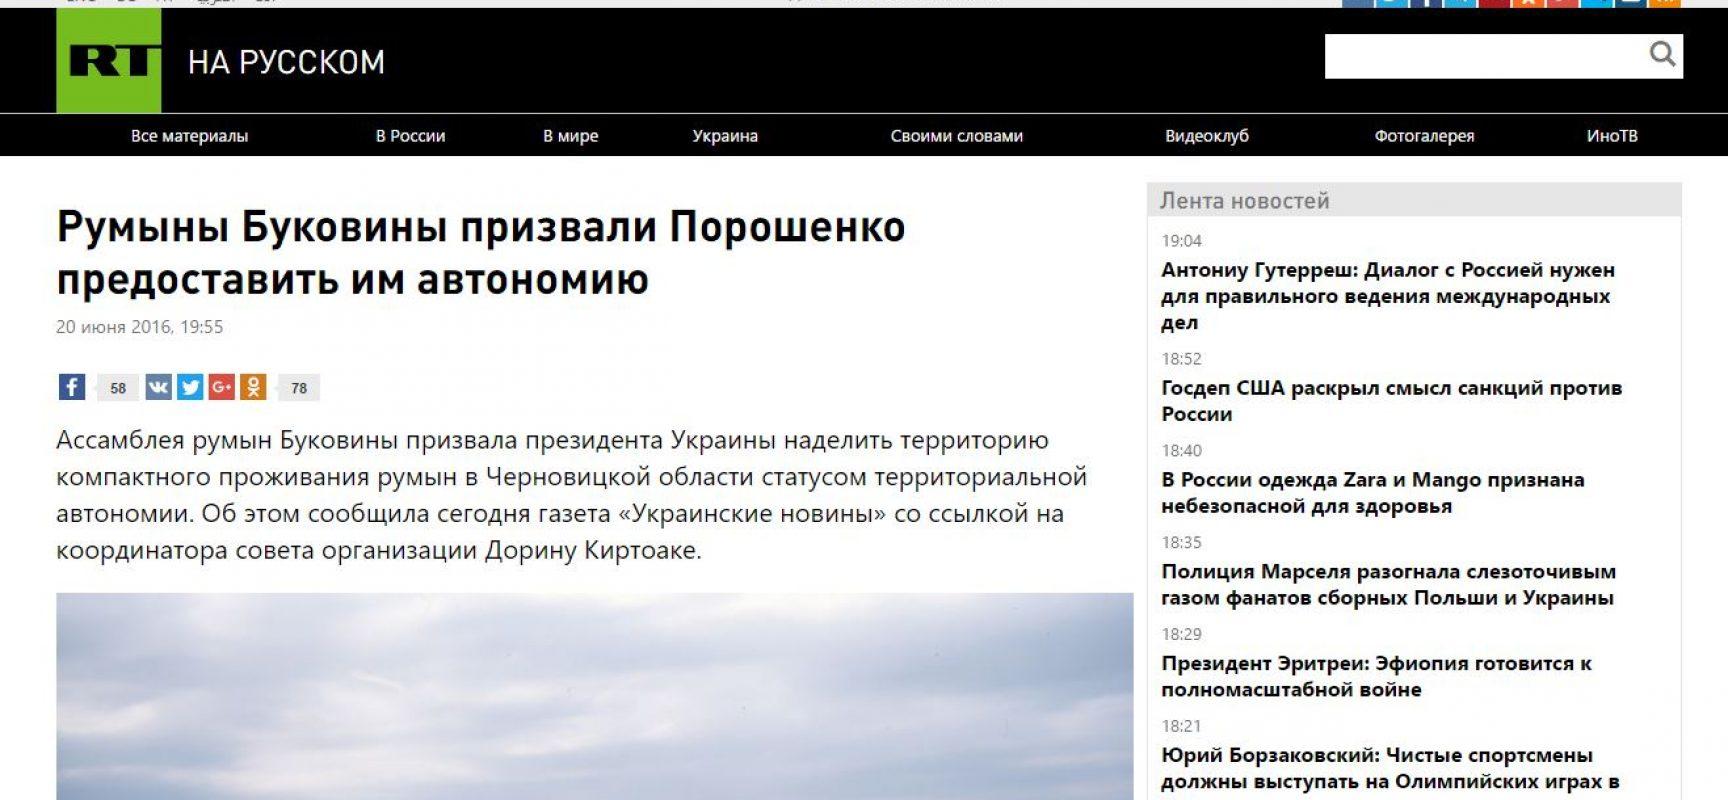 Fake: I rumeni della Bucovina chiedono a Poroshenko l'autonomia territoriale